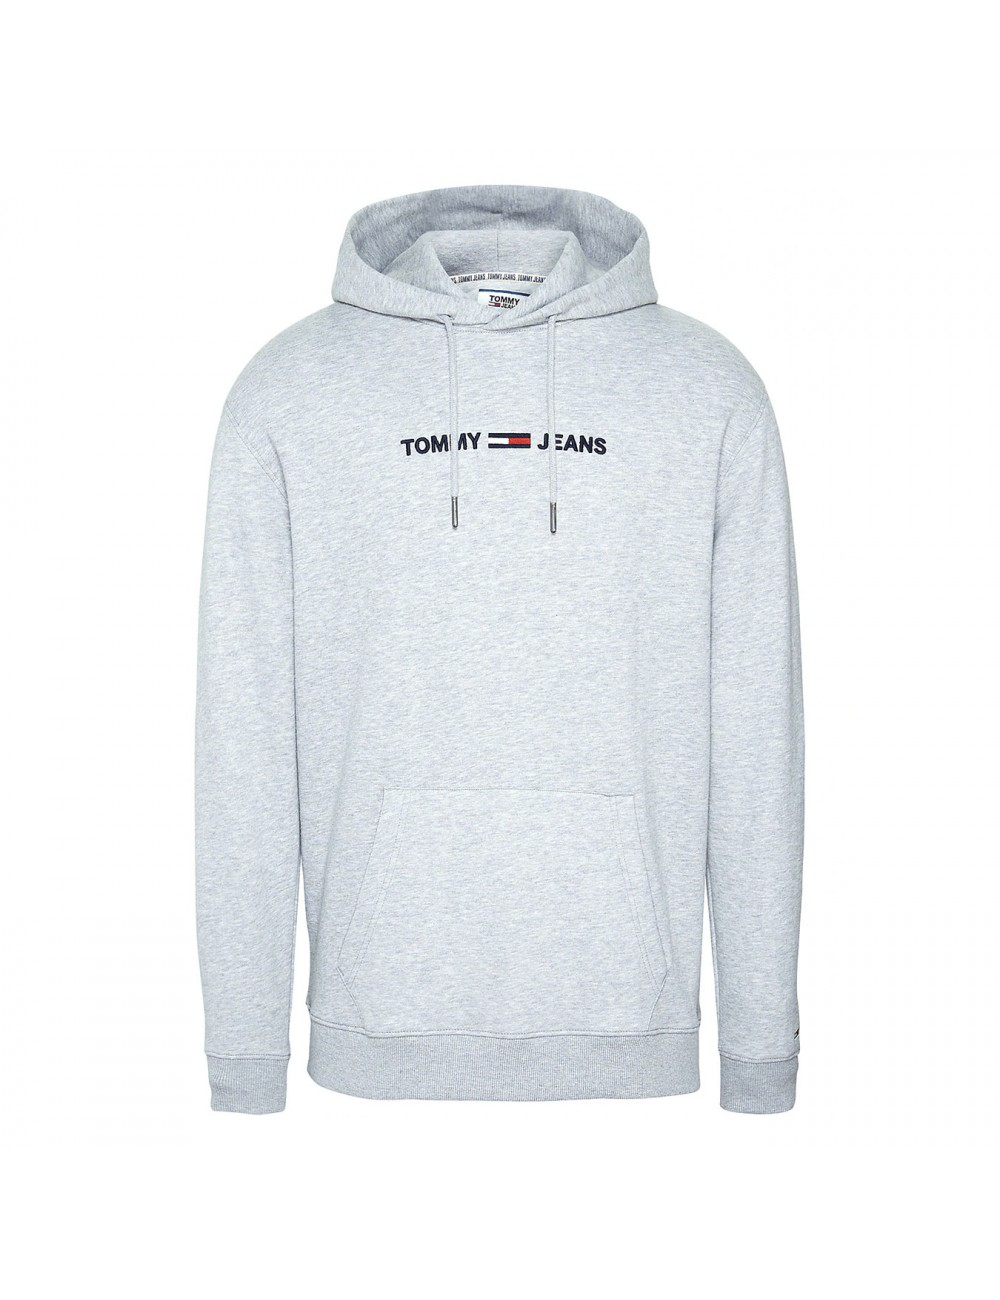 Tommy hilfiger Tjm straight logo hoodie - DM0DM07030 | Shapestore.it